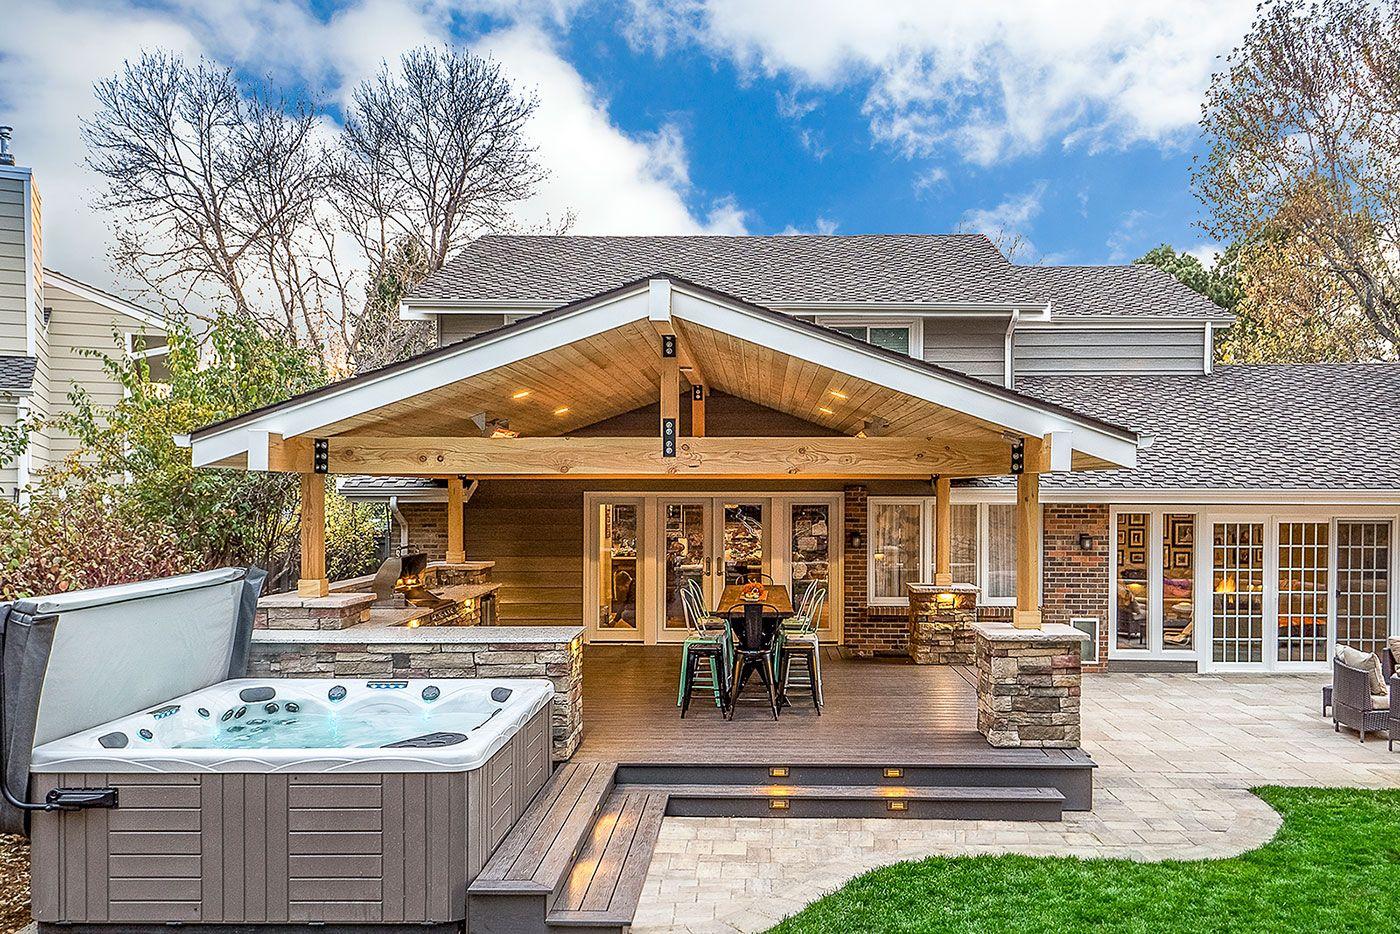 Outdoor Living Portfolio - Elite Landscape & Outdoor ... on Elite Landscape And Outdoor Living id=60460